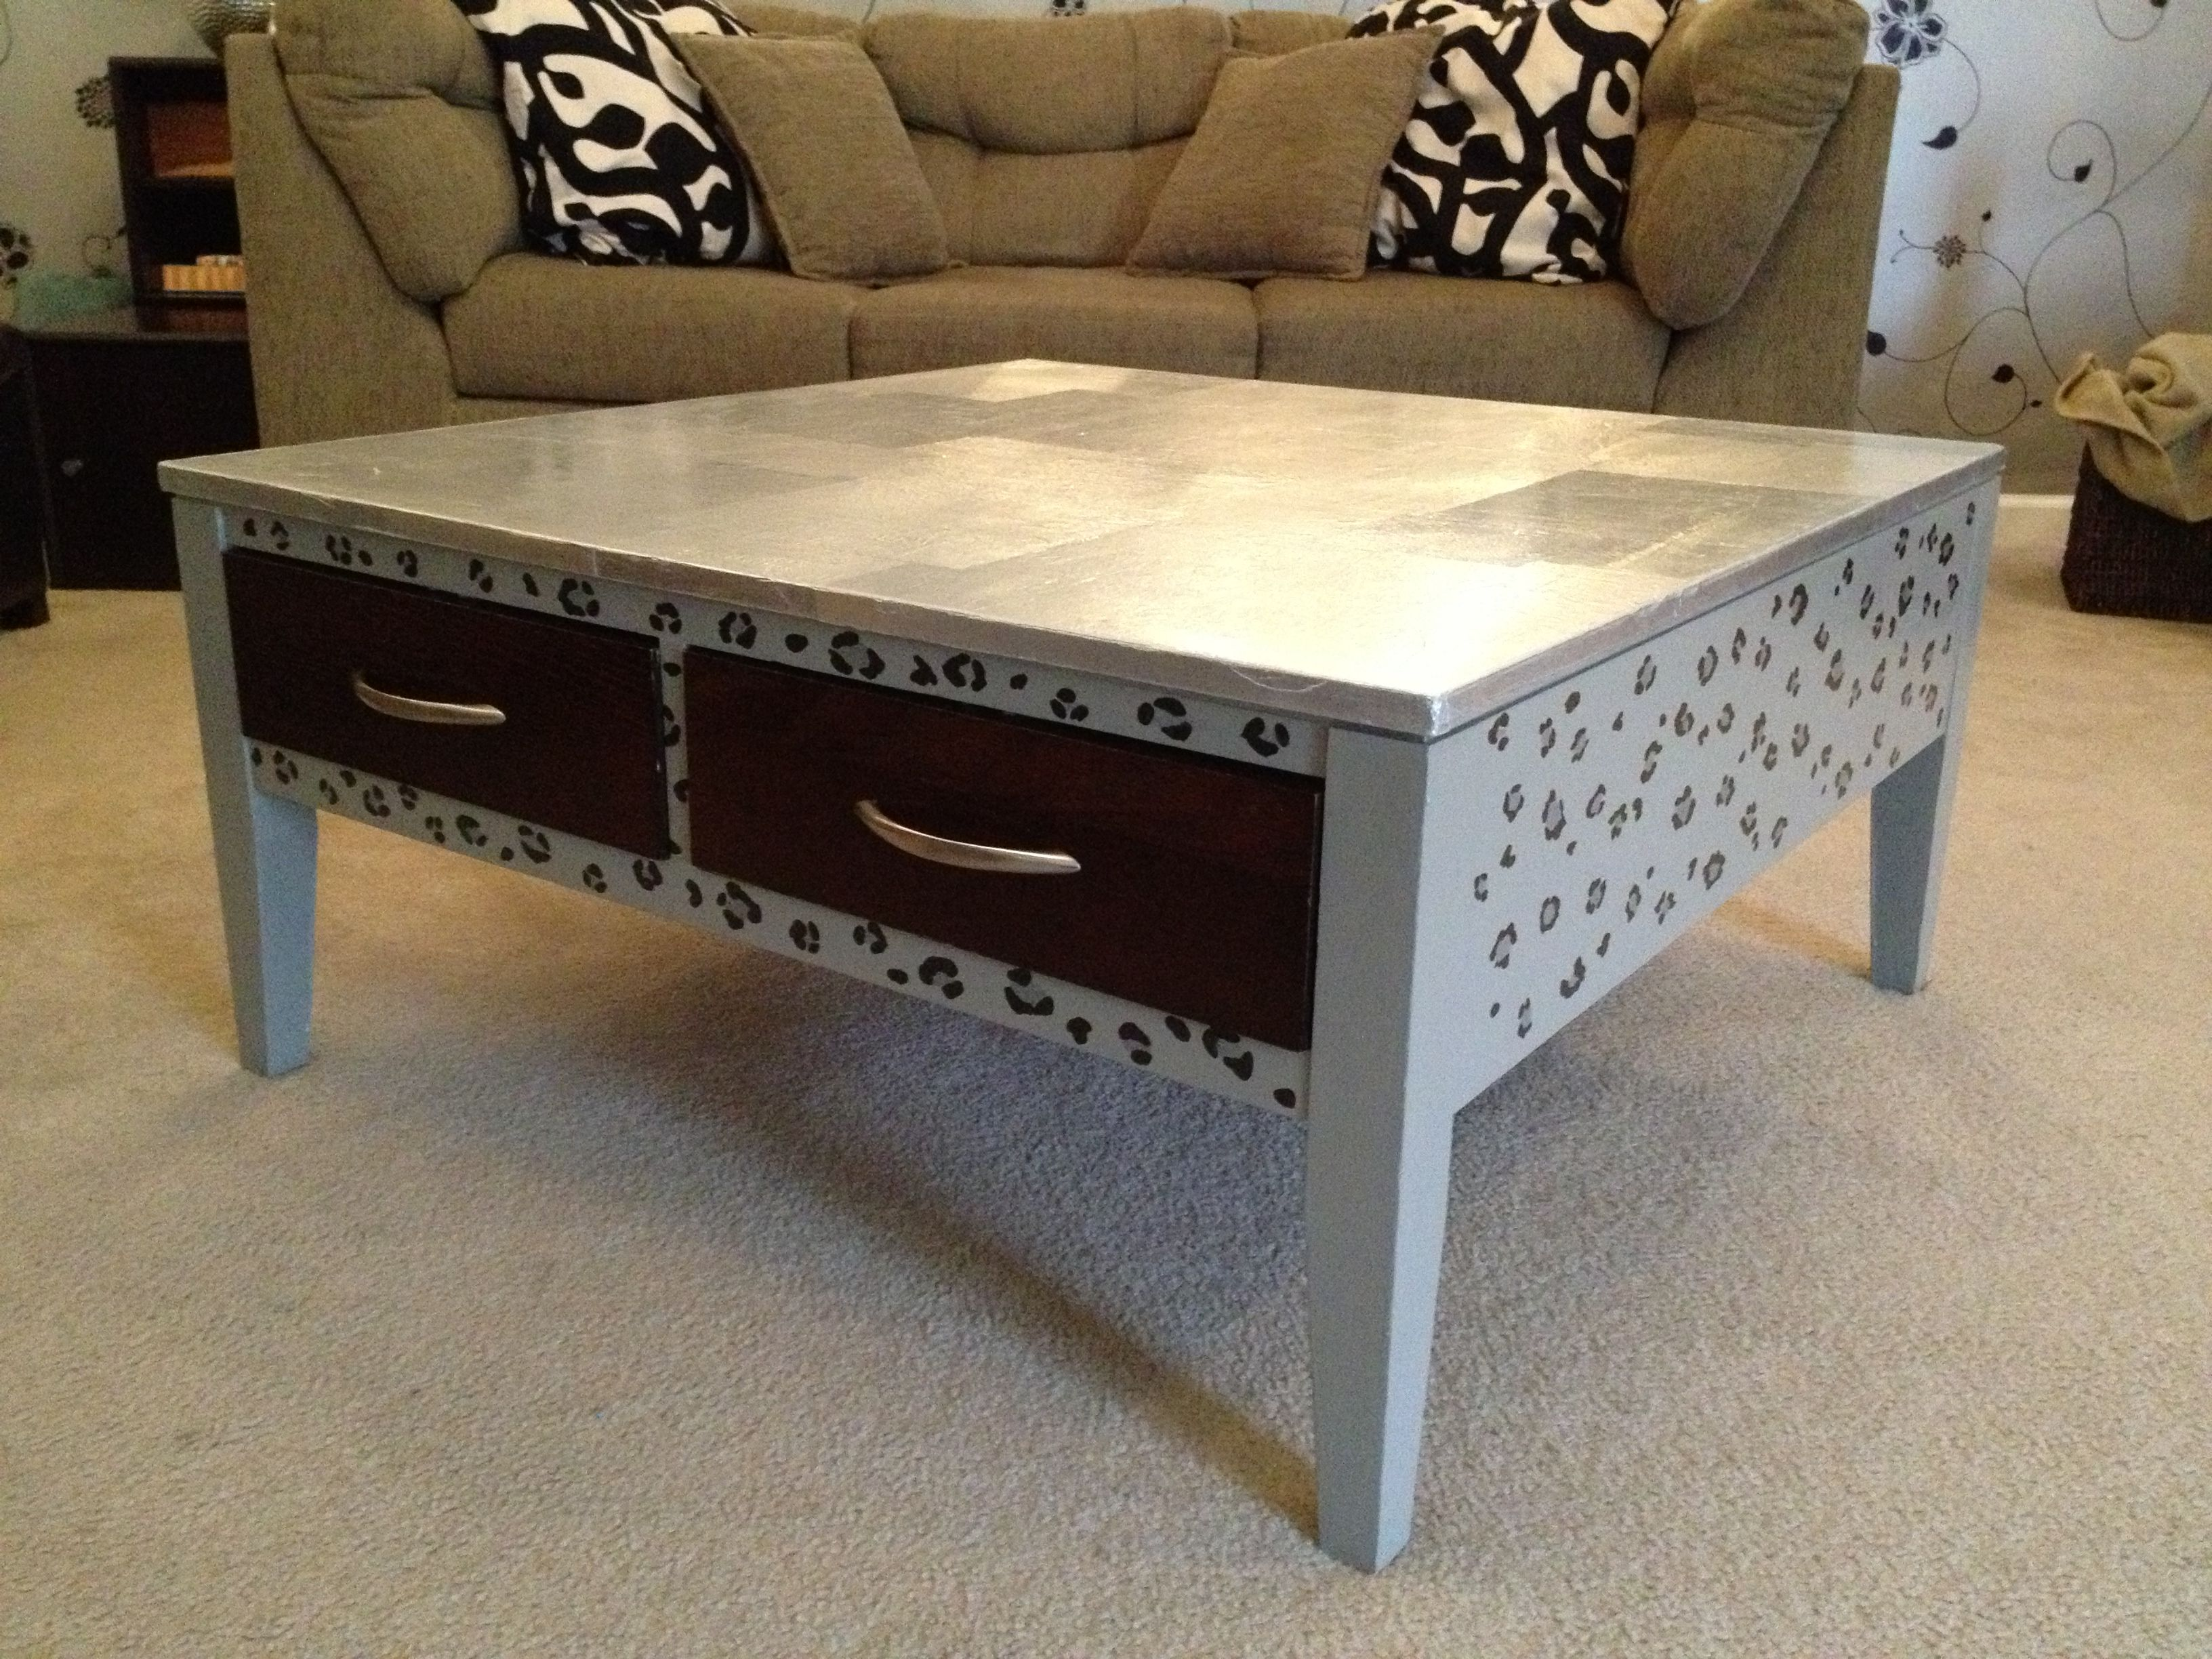 Diy Aluminum Foil Coffee Table Top Coffee Table Aluminum Foil Furniture Build A Coffee Table